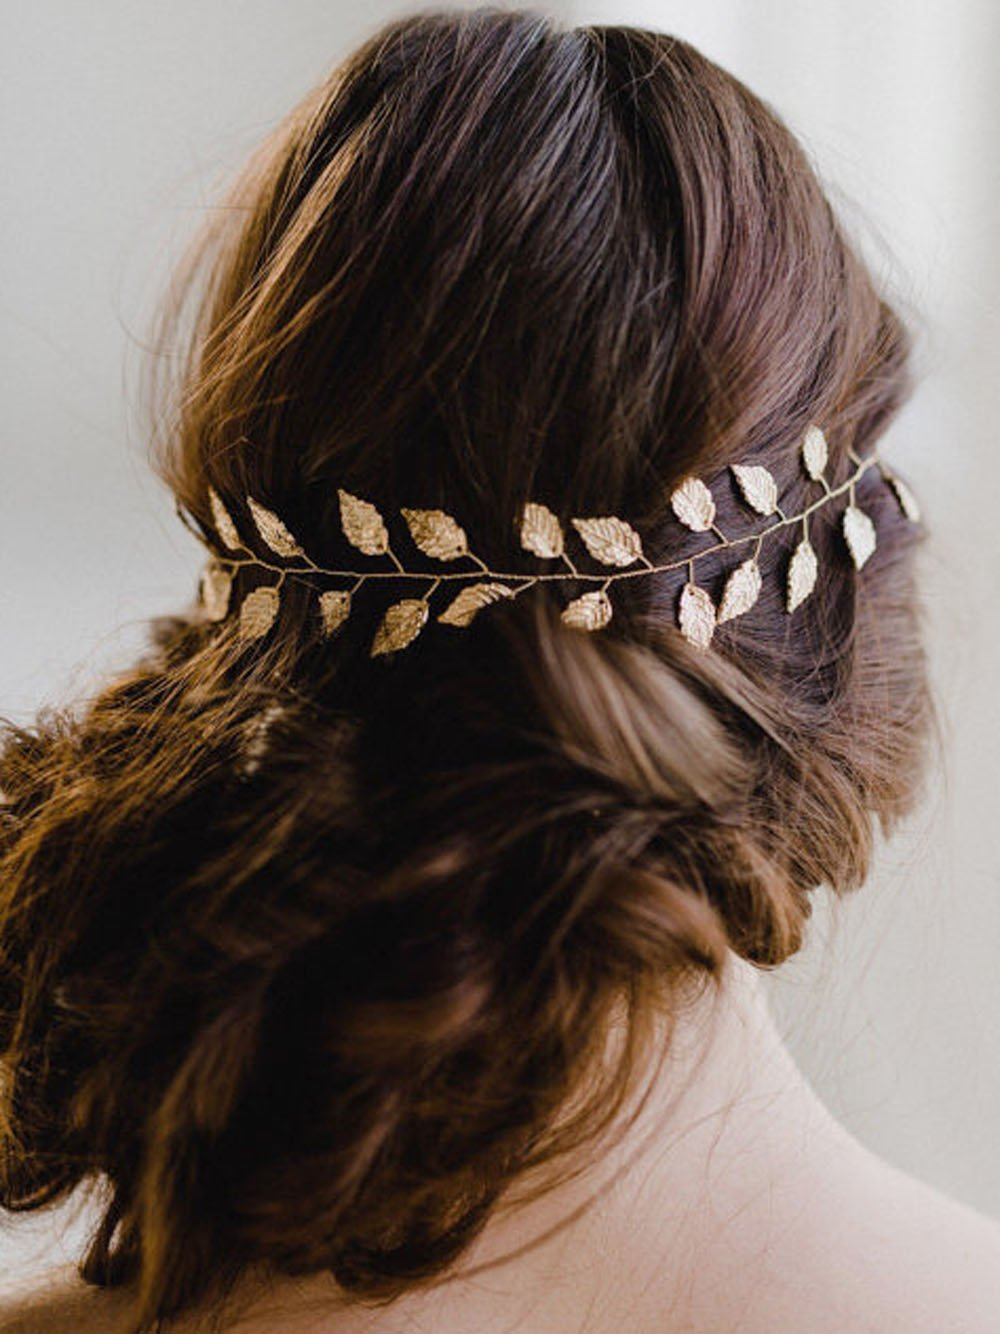 Yean Wedding Headband Gold Leaf Bridal Headpieces for Bridesmaid and Flowergirls (15.7 Inches) (Gold)